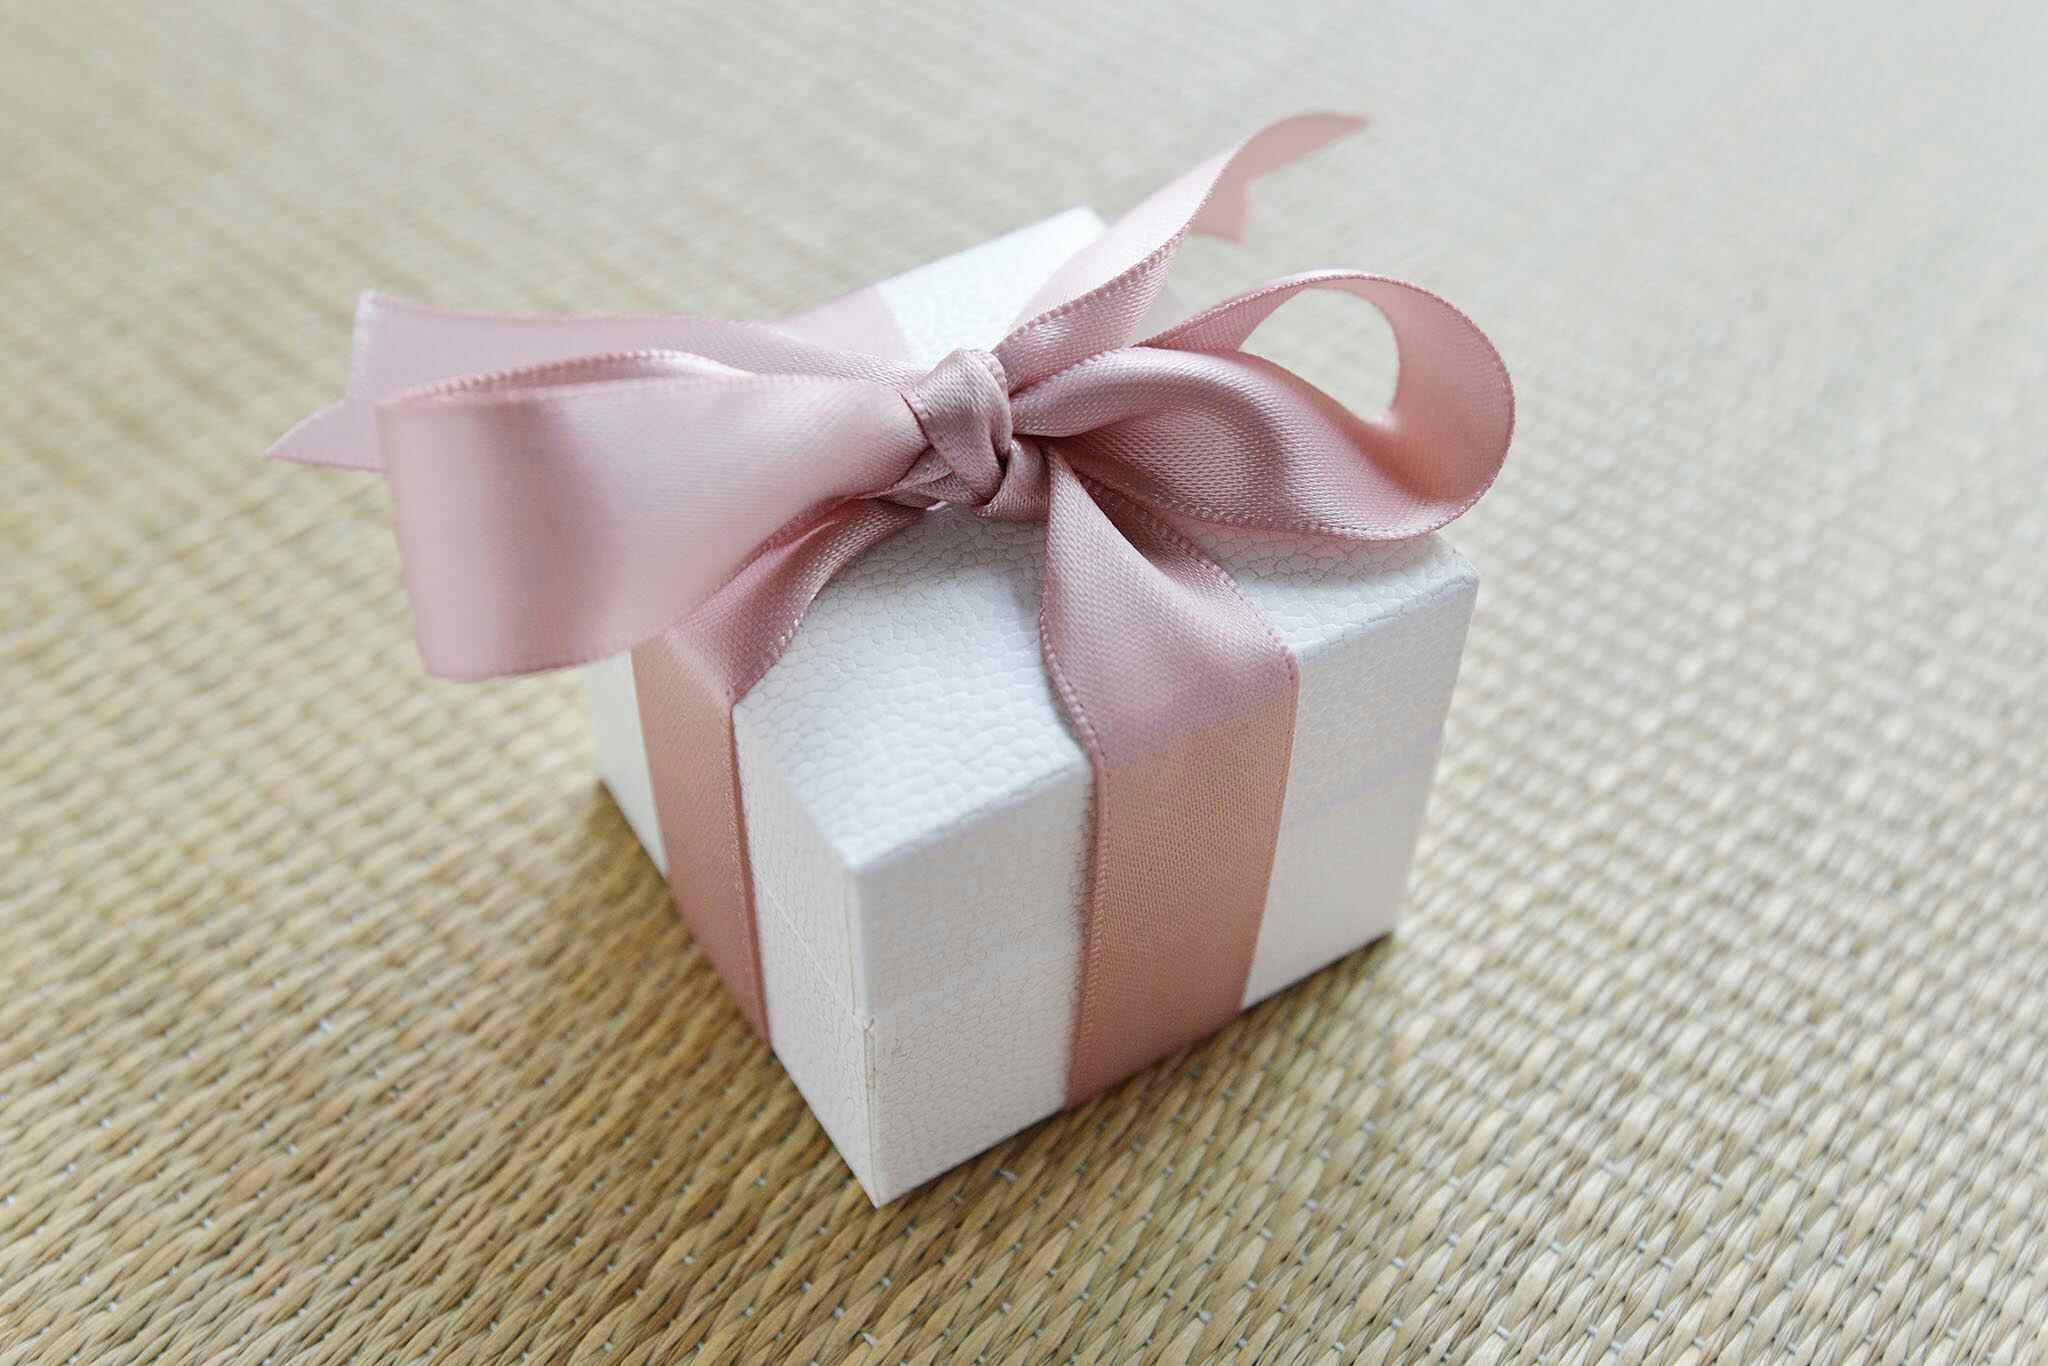 6 gift ideas for your kid's boyfriend or girlfiend